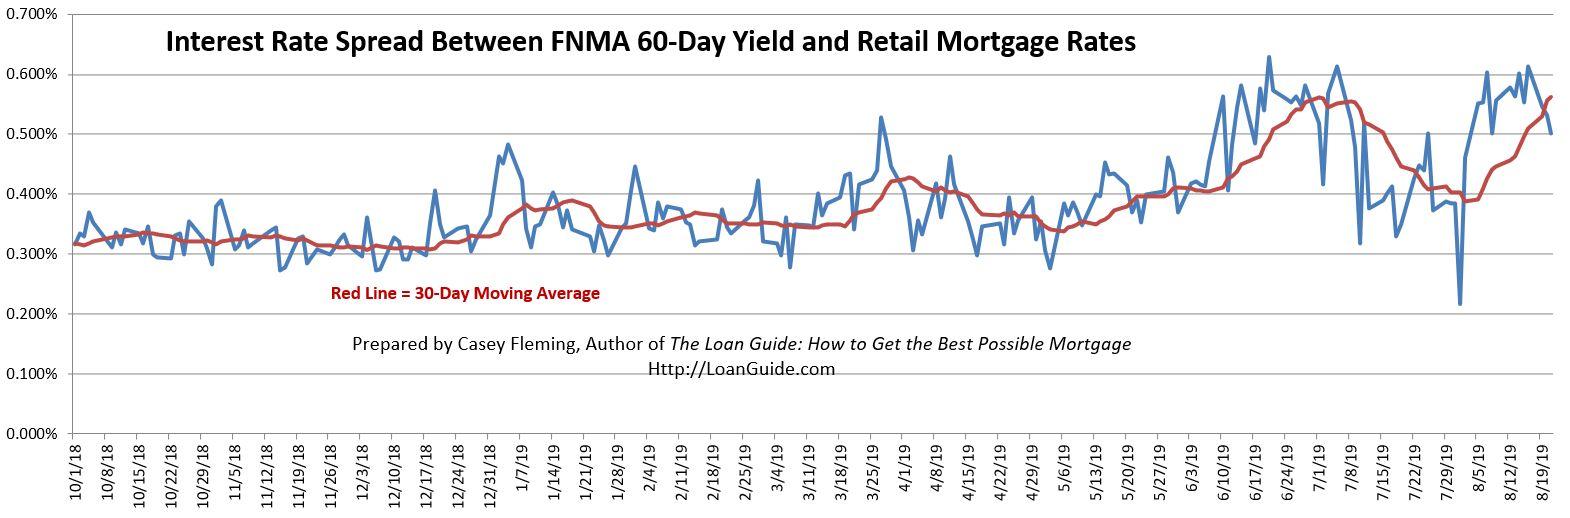 Lender margins have increased this month